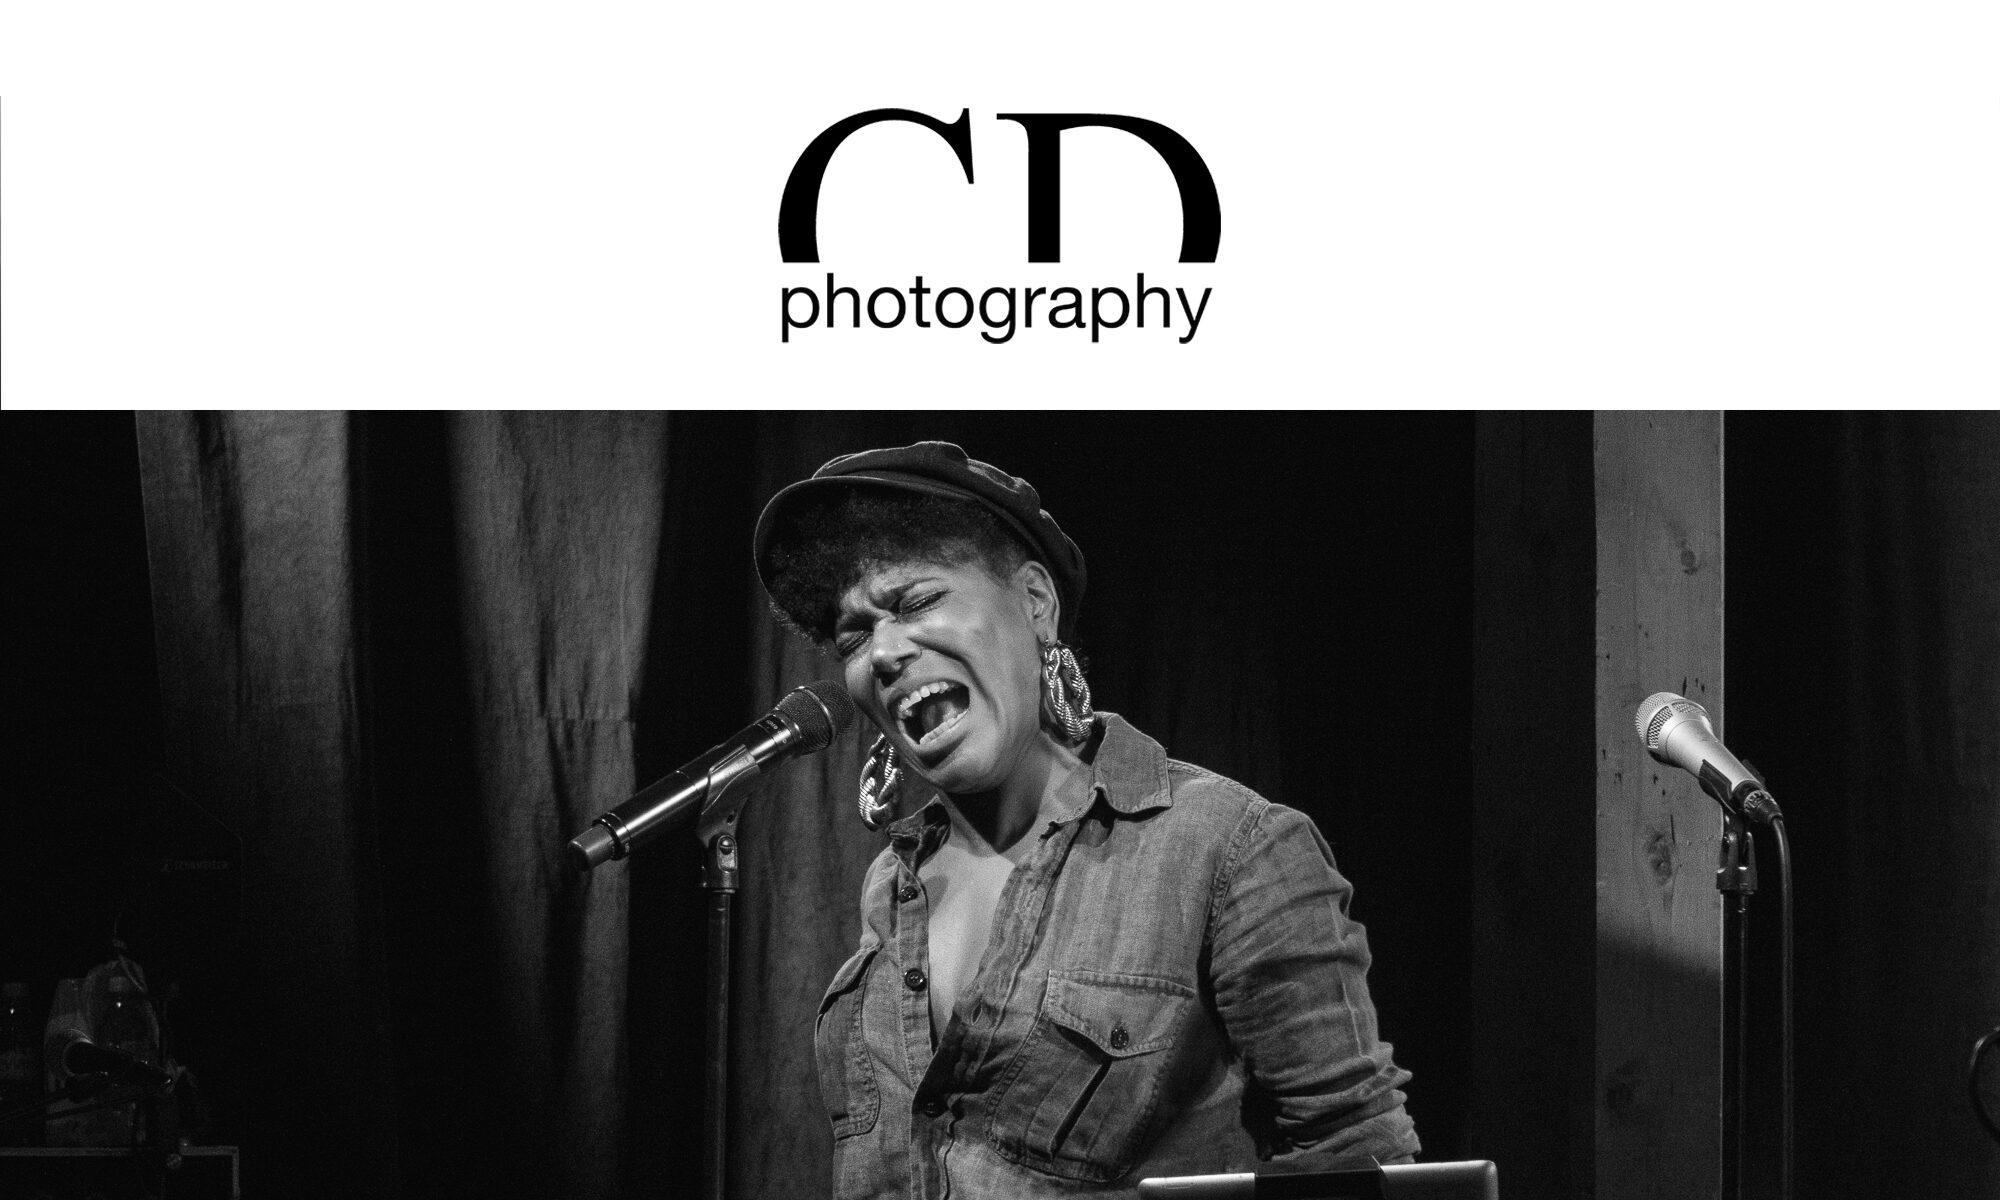 CD Photography